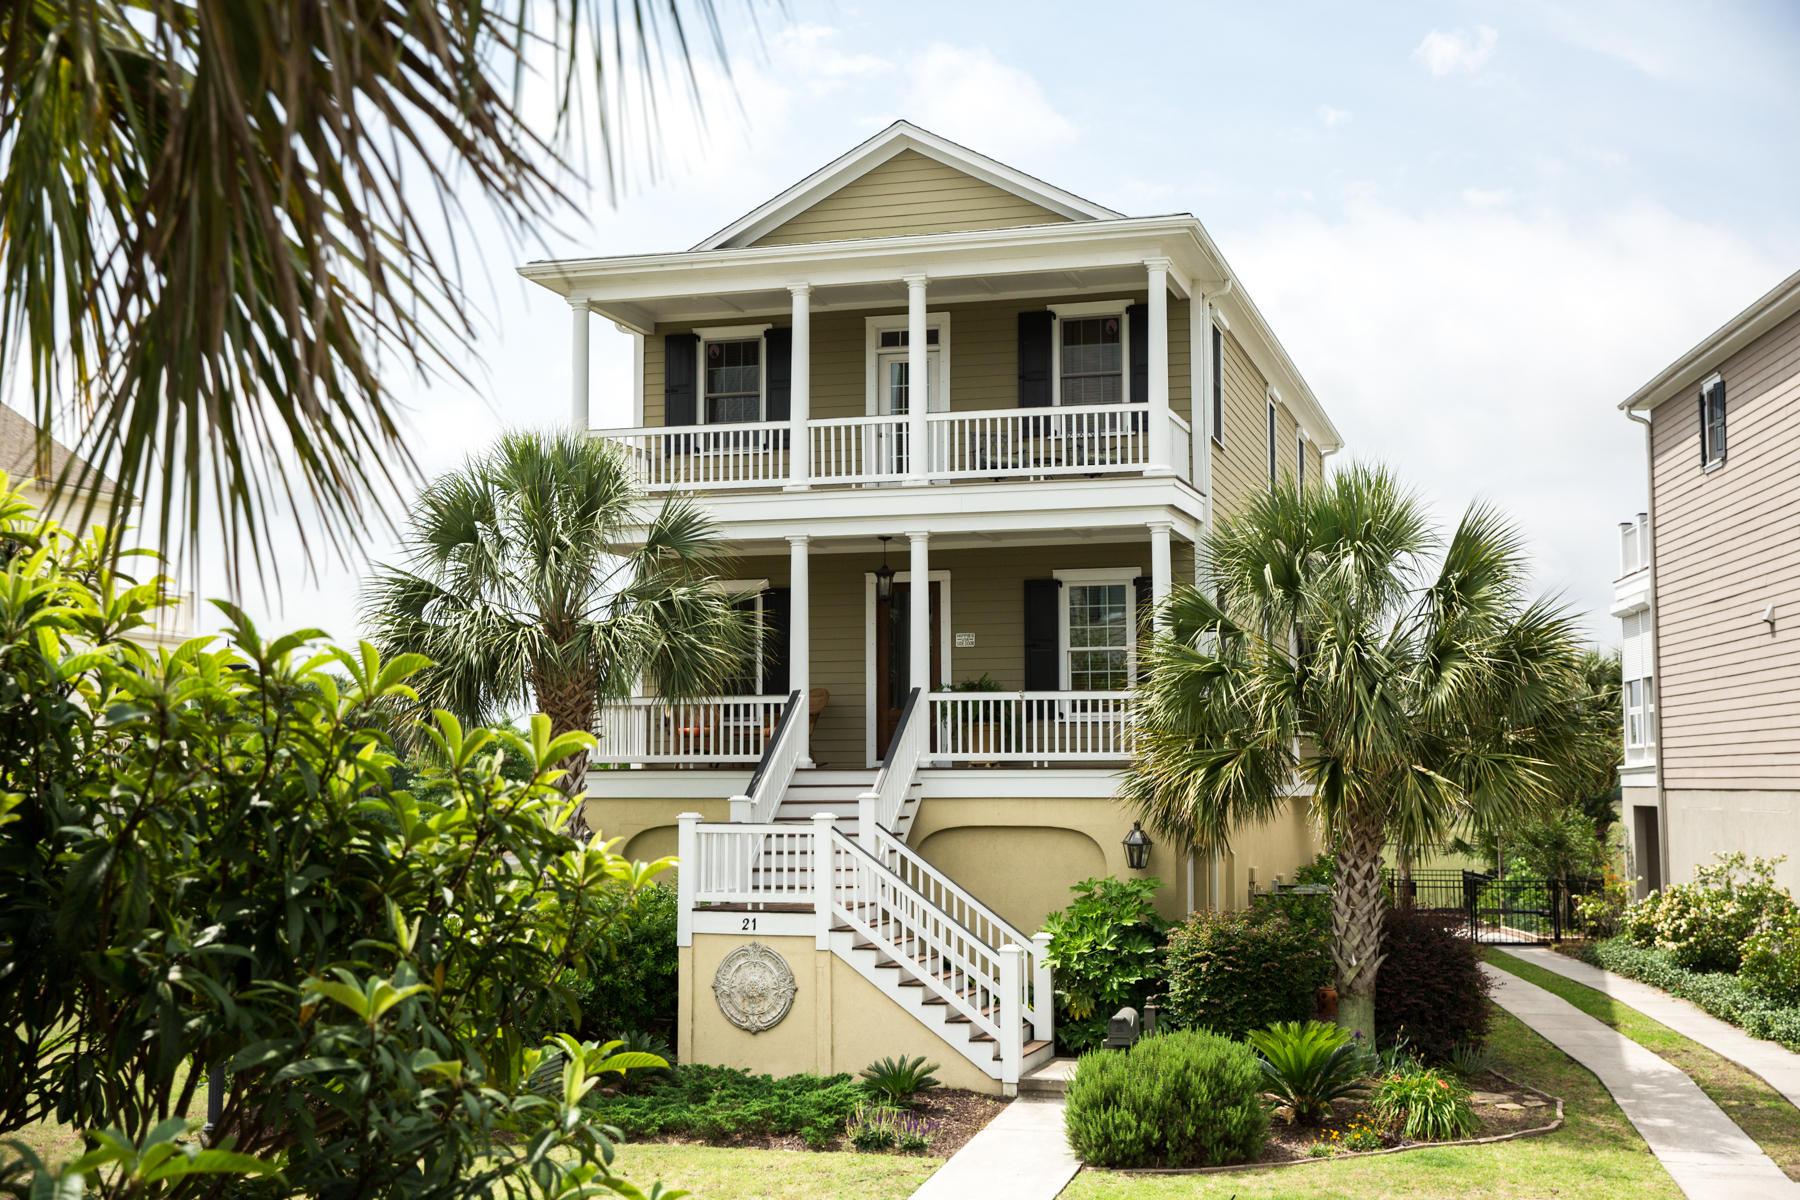 21 Lowndes Pointe Drive Charleston, Sc 29403